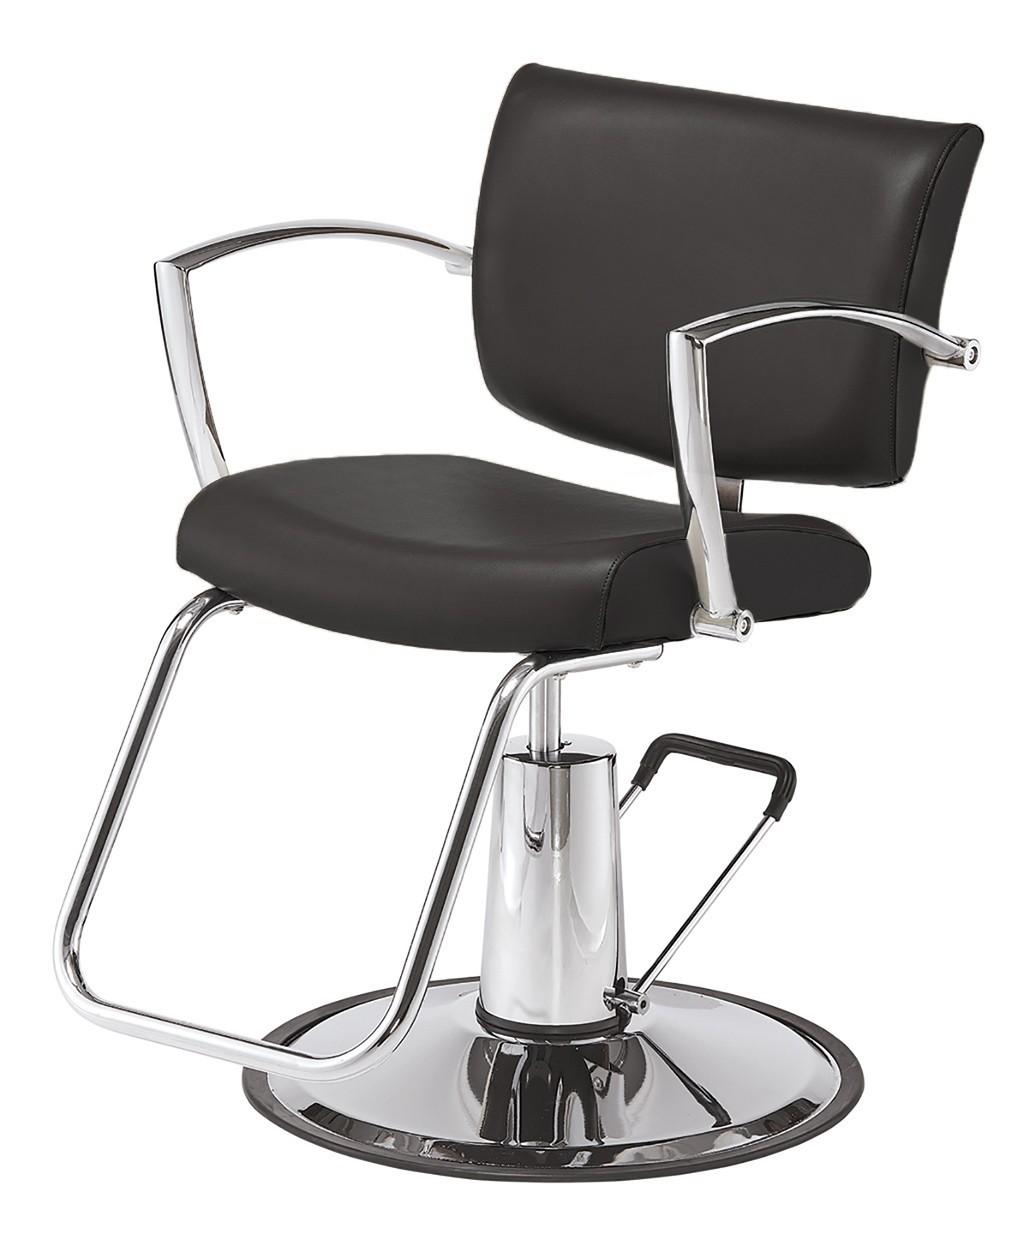 Pibbs 5806 Rosa Styling Chair